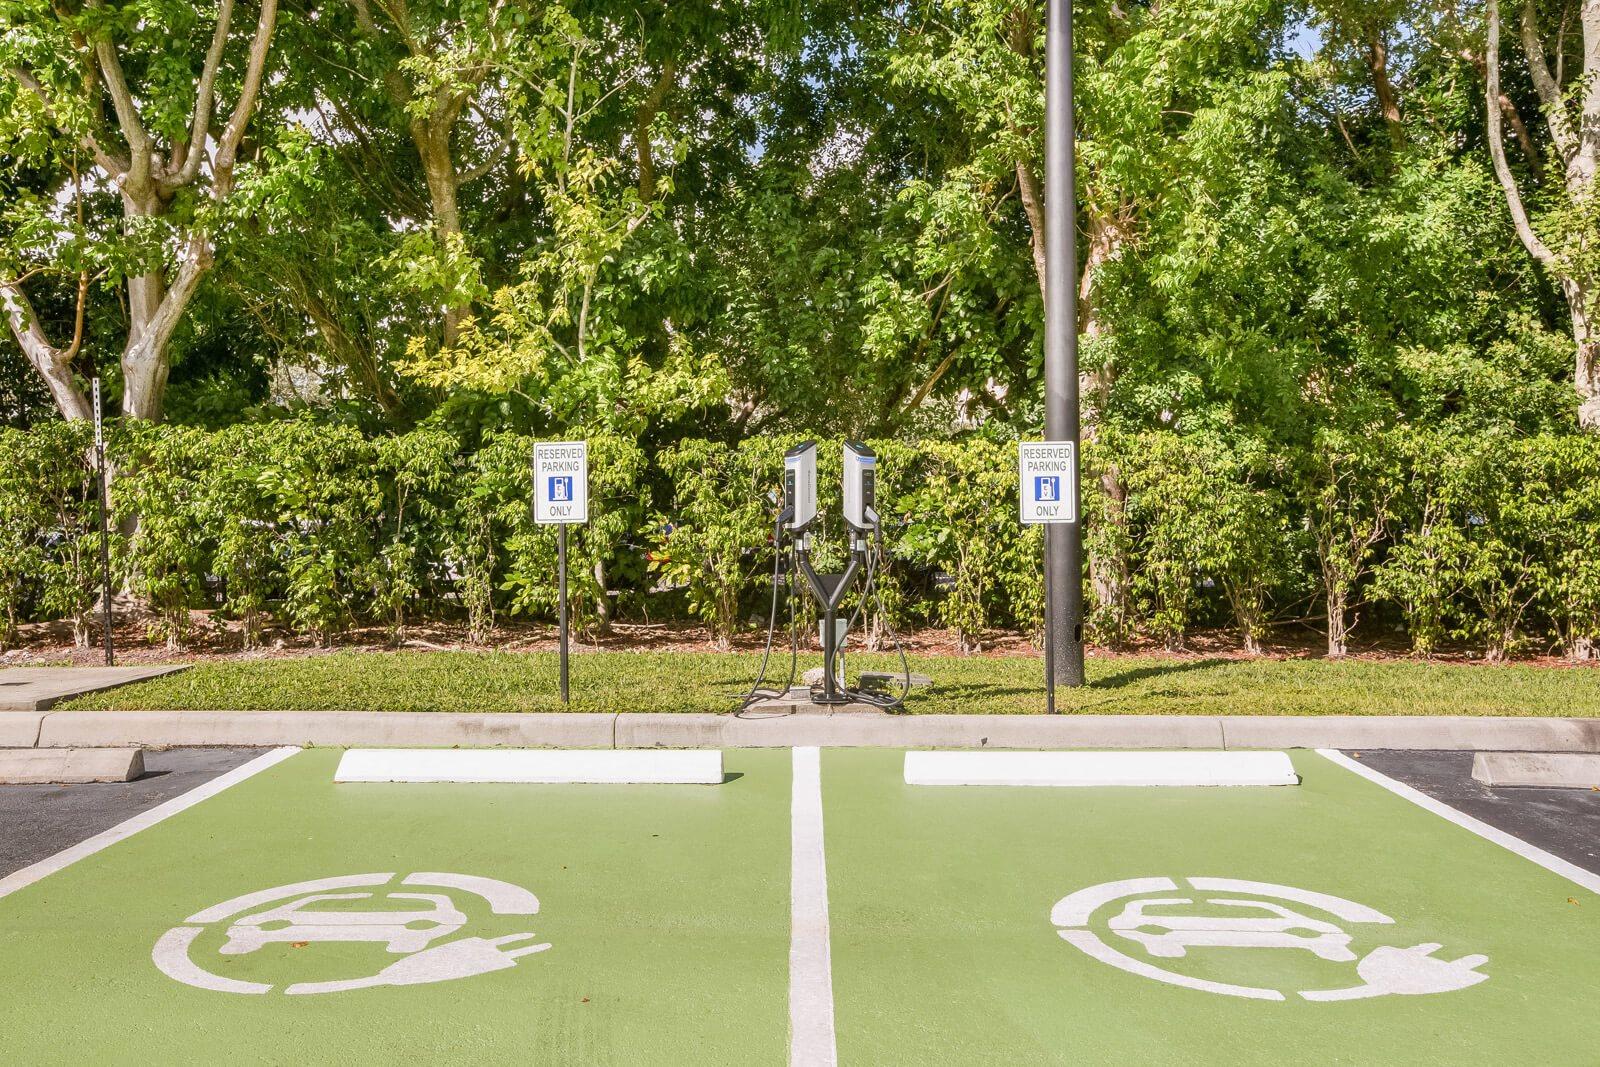 EV car charging stations at Windsor at Miramar, 3701 Southwest 160th Avenue, Miramar